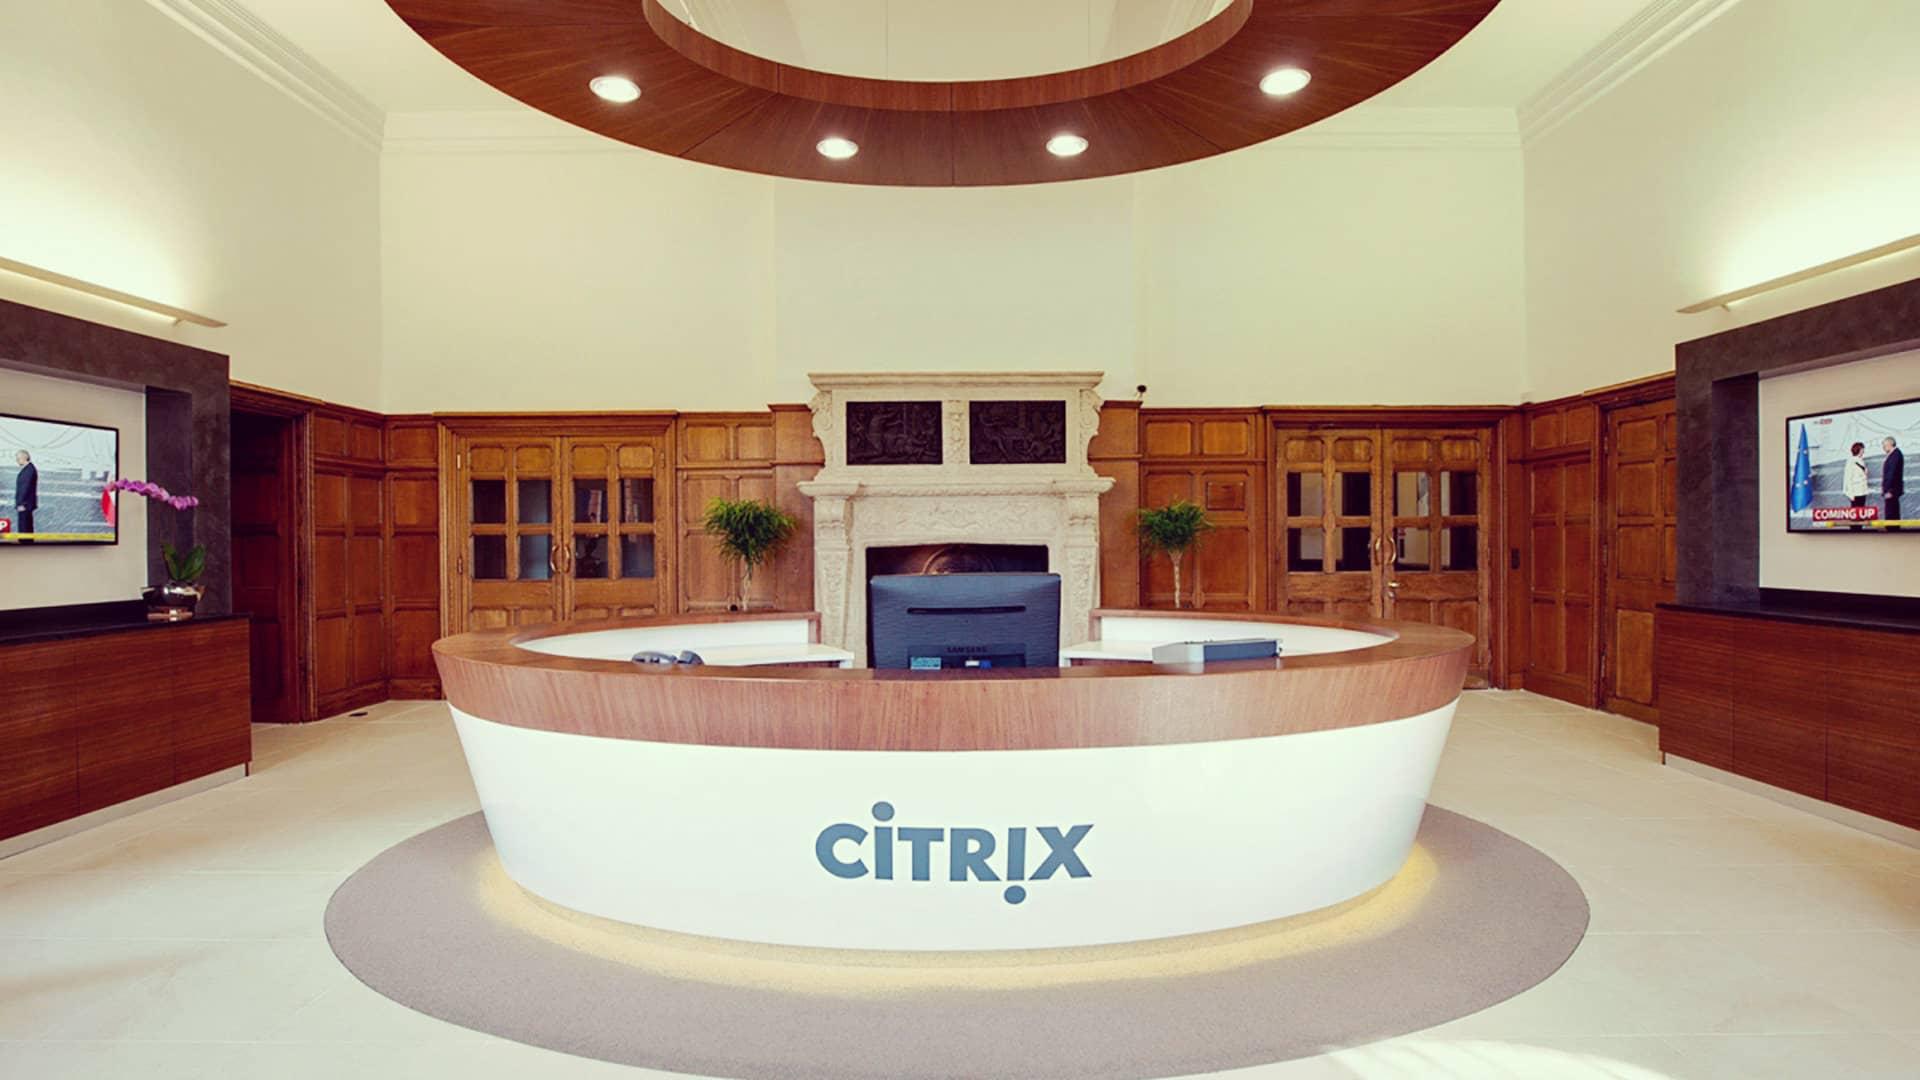 Citrix Case Study